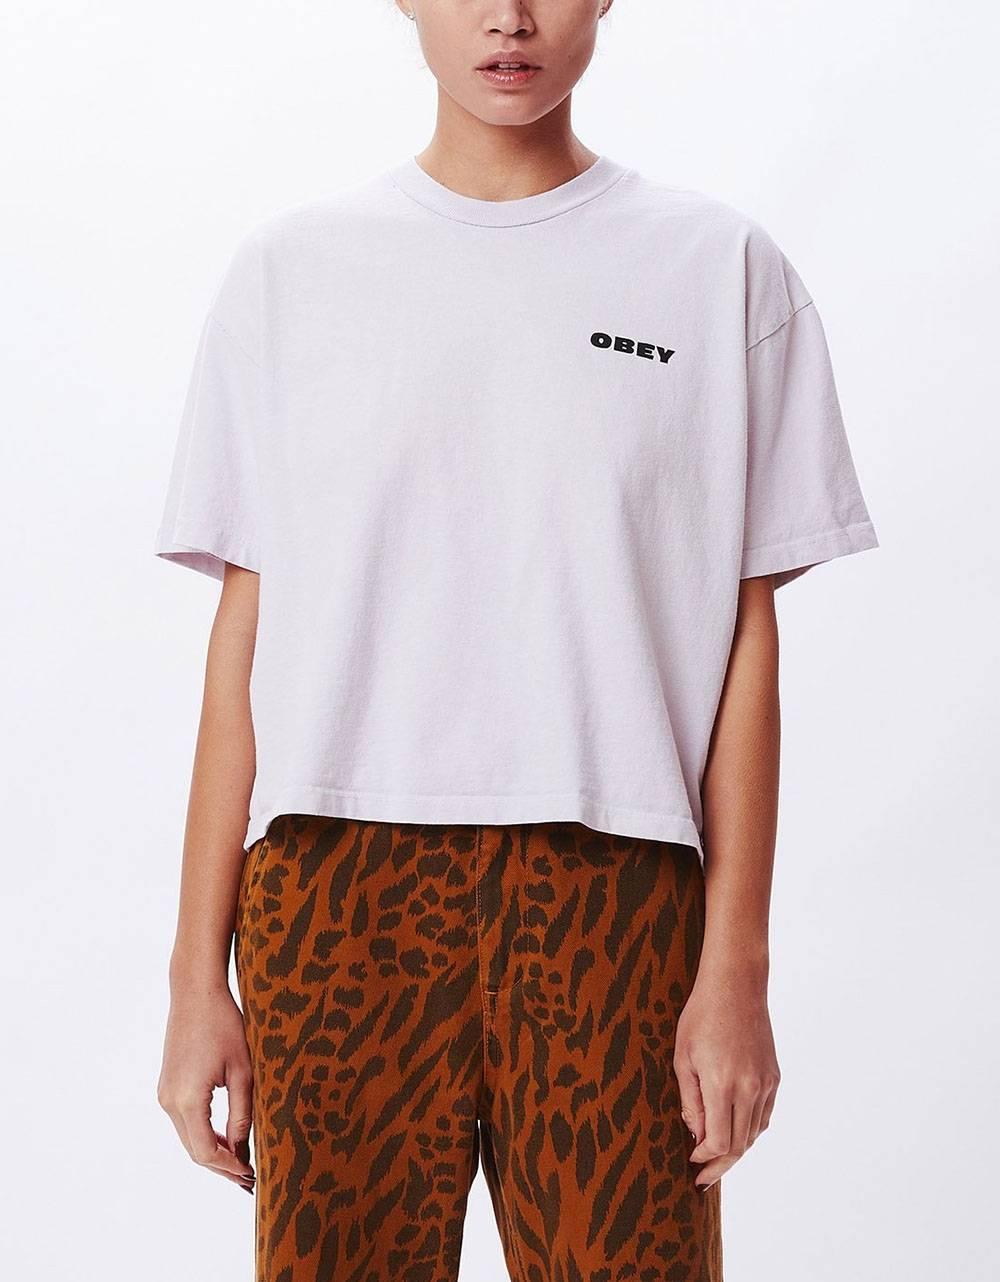 Obey Woman demolition crew custom crop tee - lilac hint obey T-shirt 45,00€